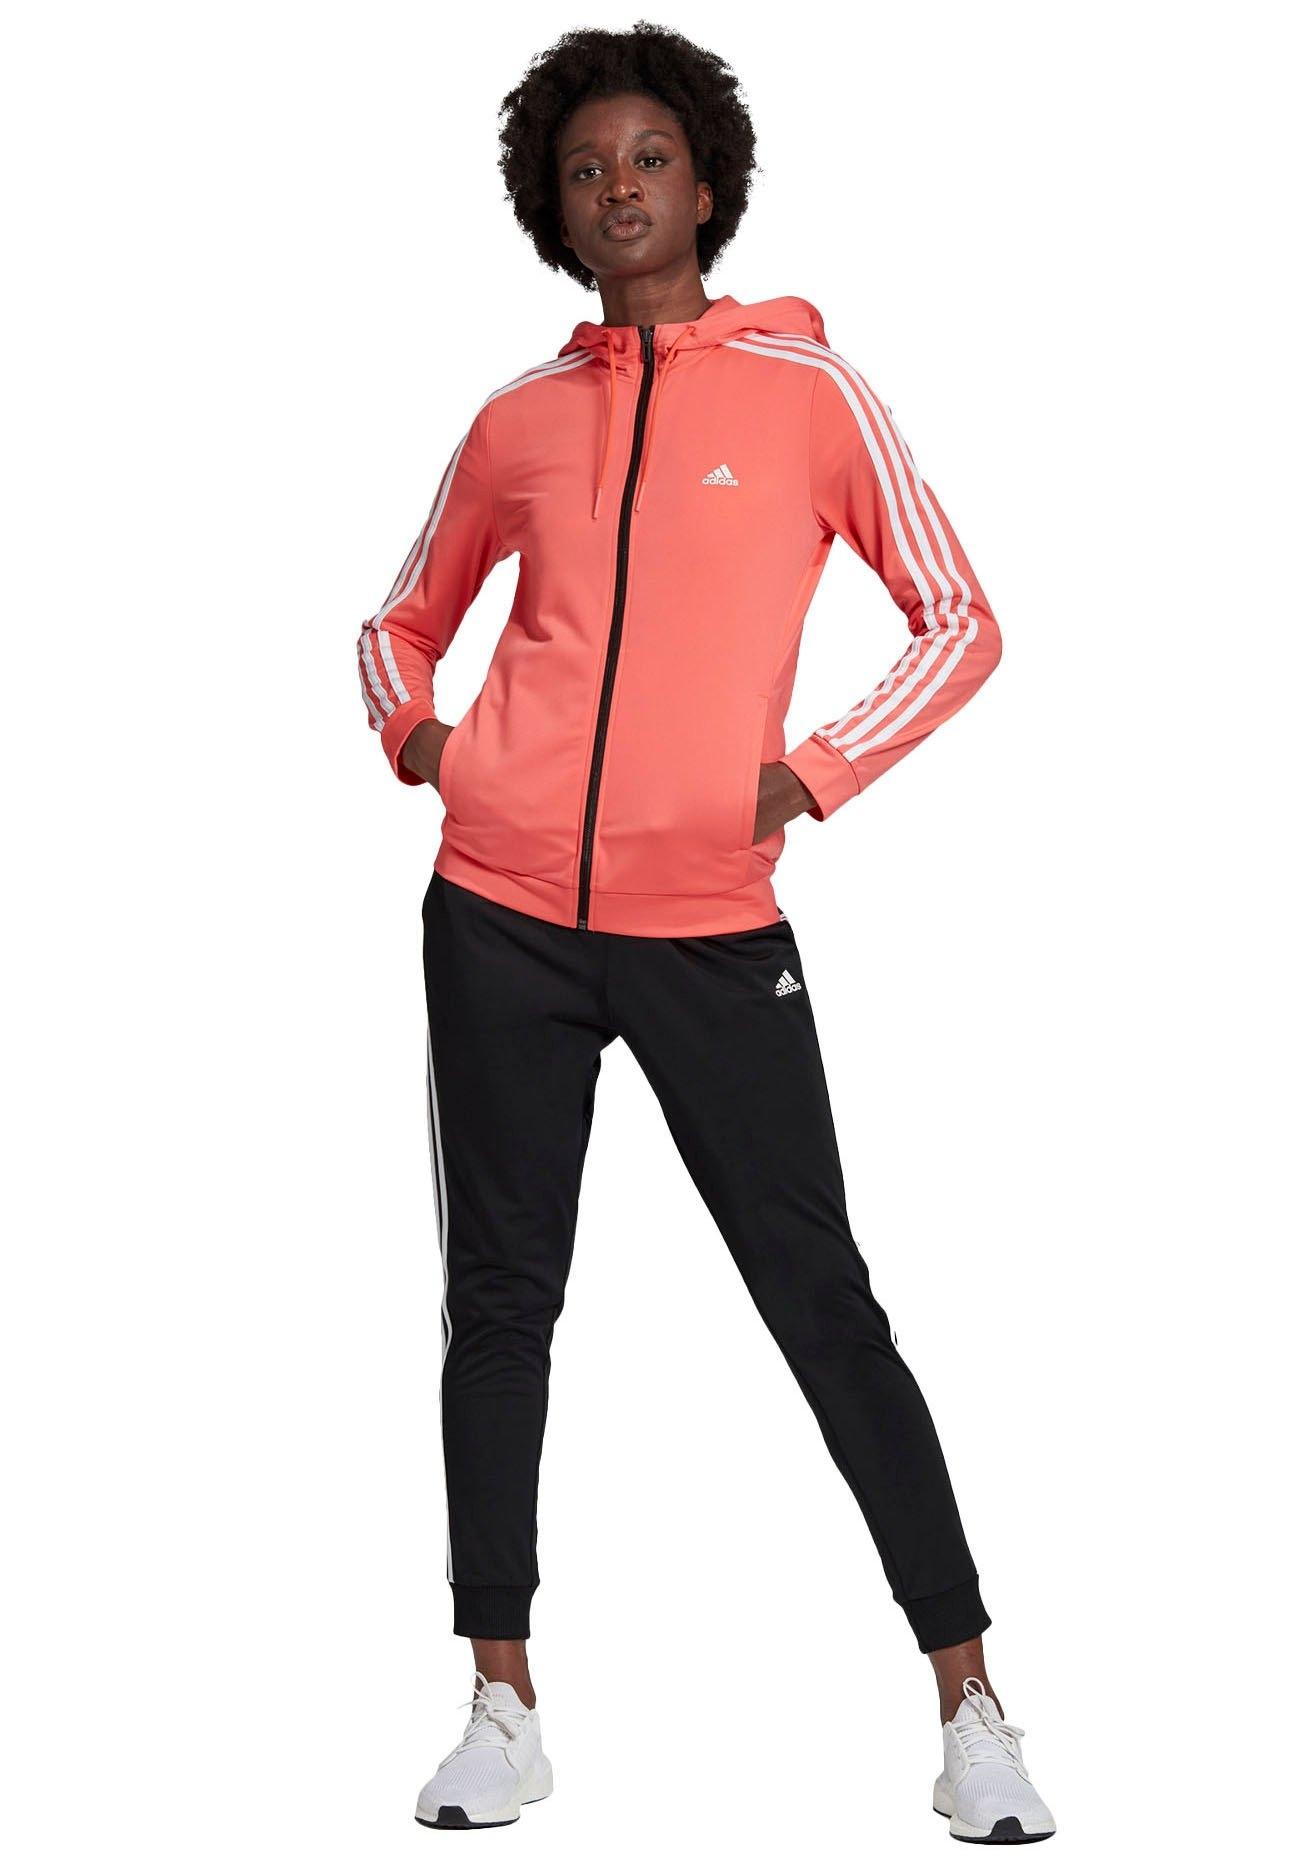 adidas Performance Trainingspak PES 3 STRIPES TRACKSUIT W (set, 2-delig) nu online kopen bij OTTO